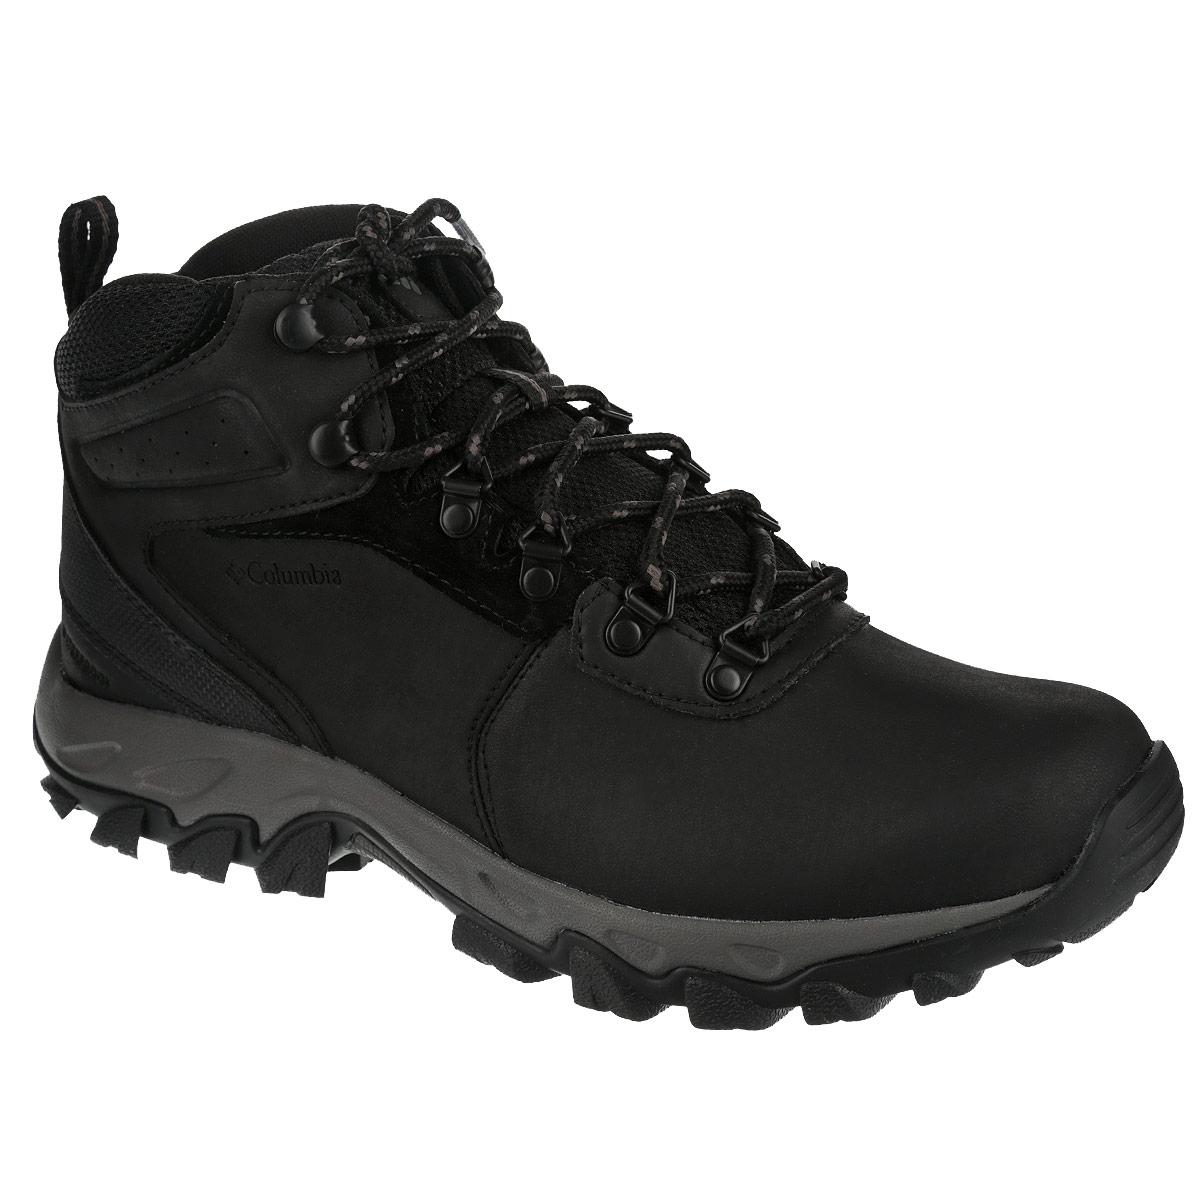 Ботинки трекинговые мужские Newton Ridge Plus II. BM3970-010